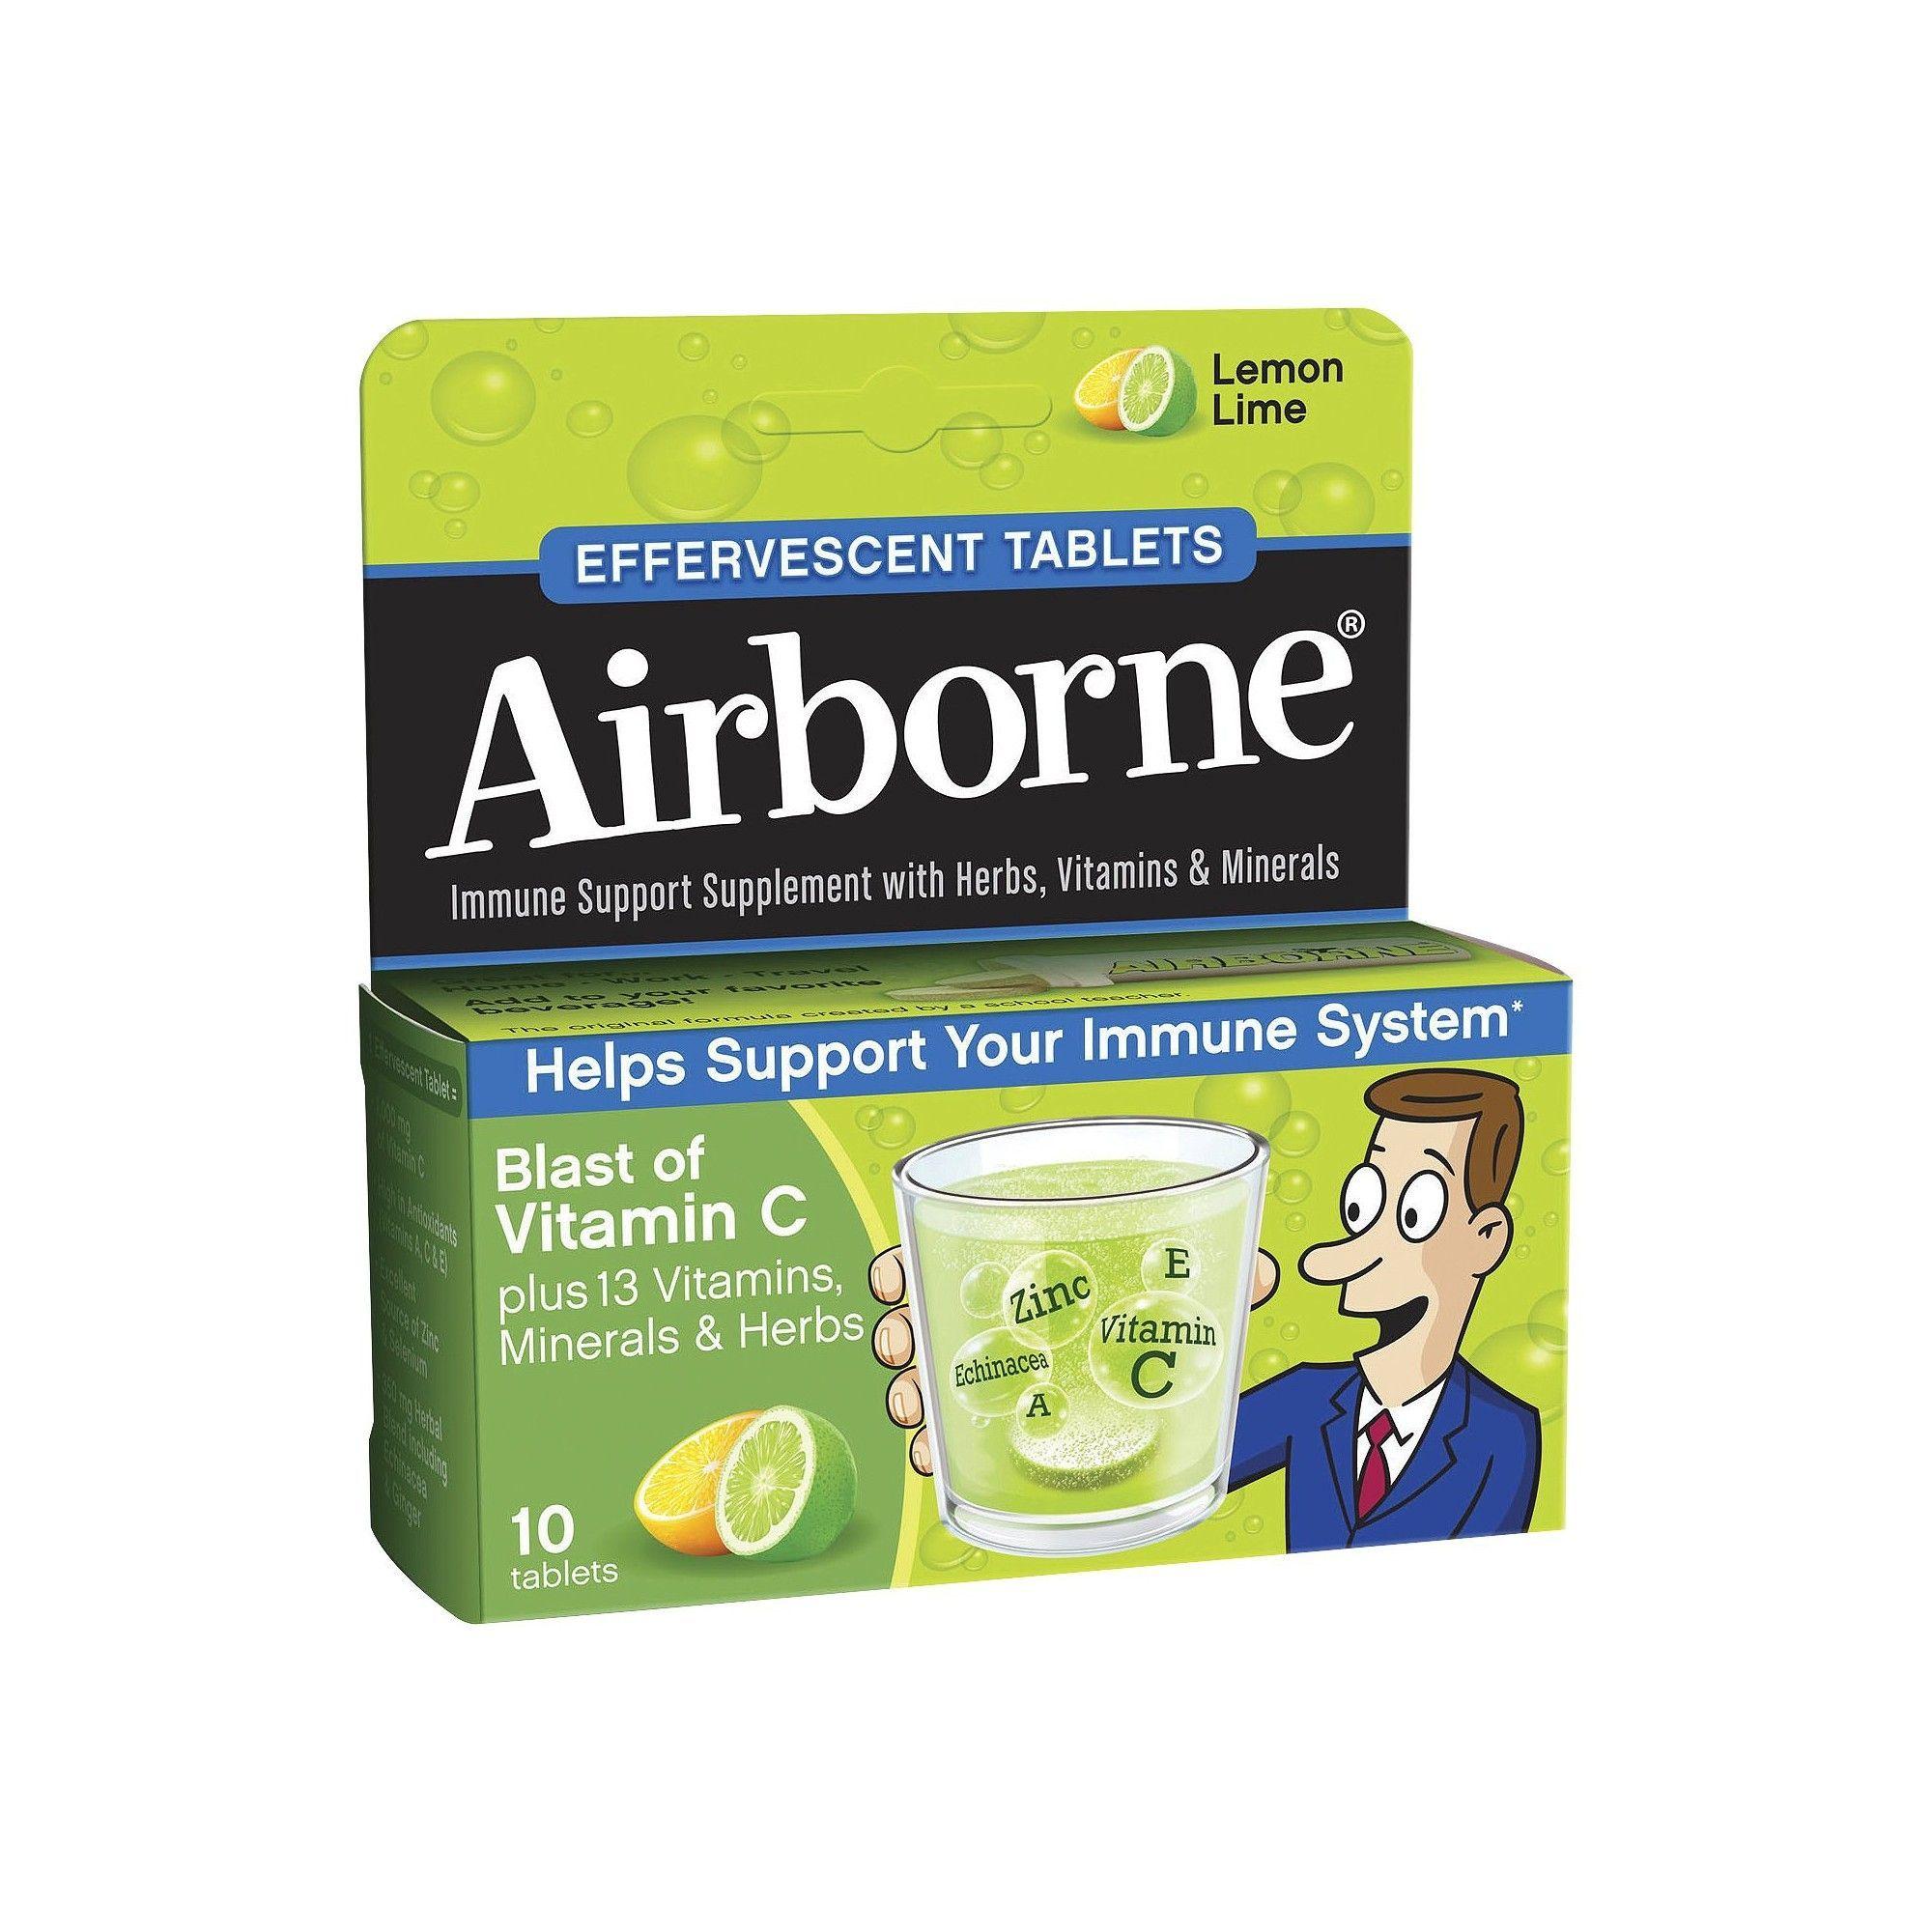 Airborne Effervescent Immune Support Supplement with